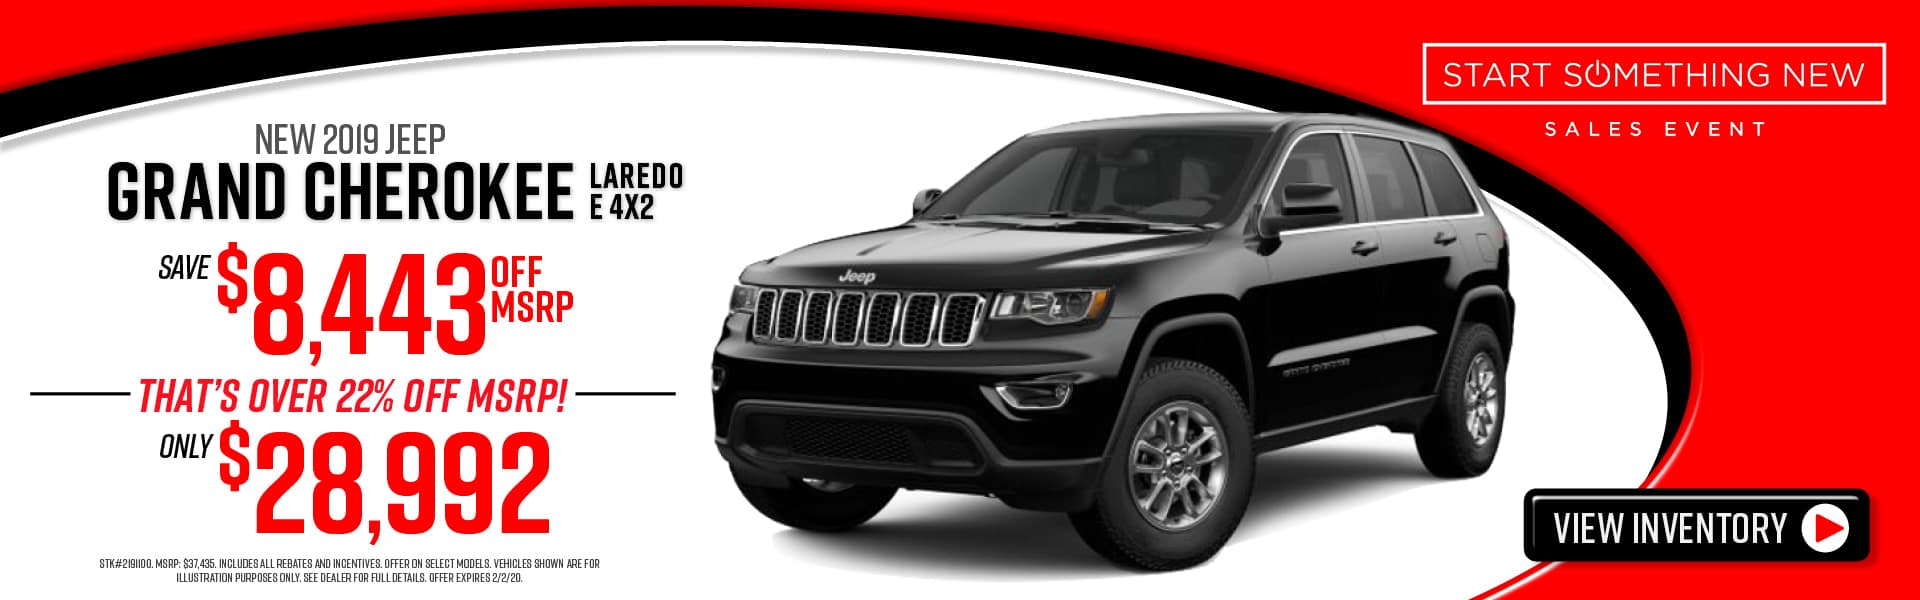 2019 Jeep Grand Cherokee special in Atlanta, GA